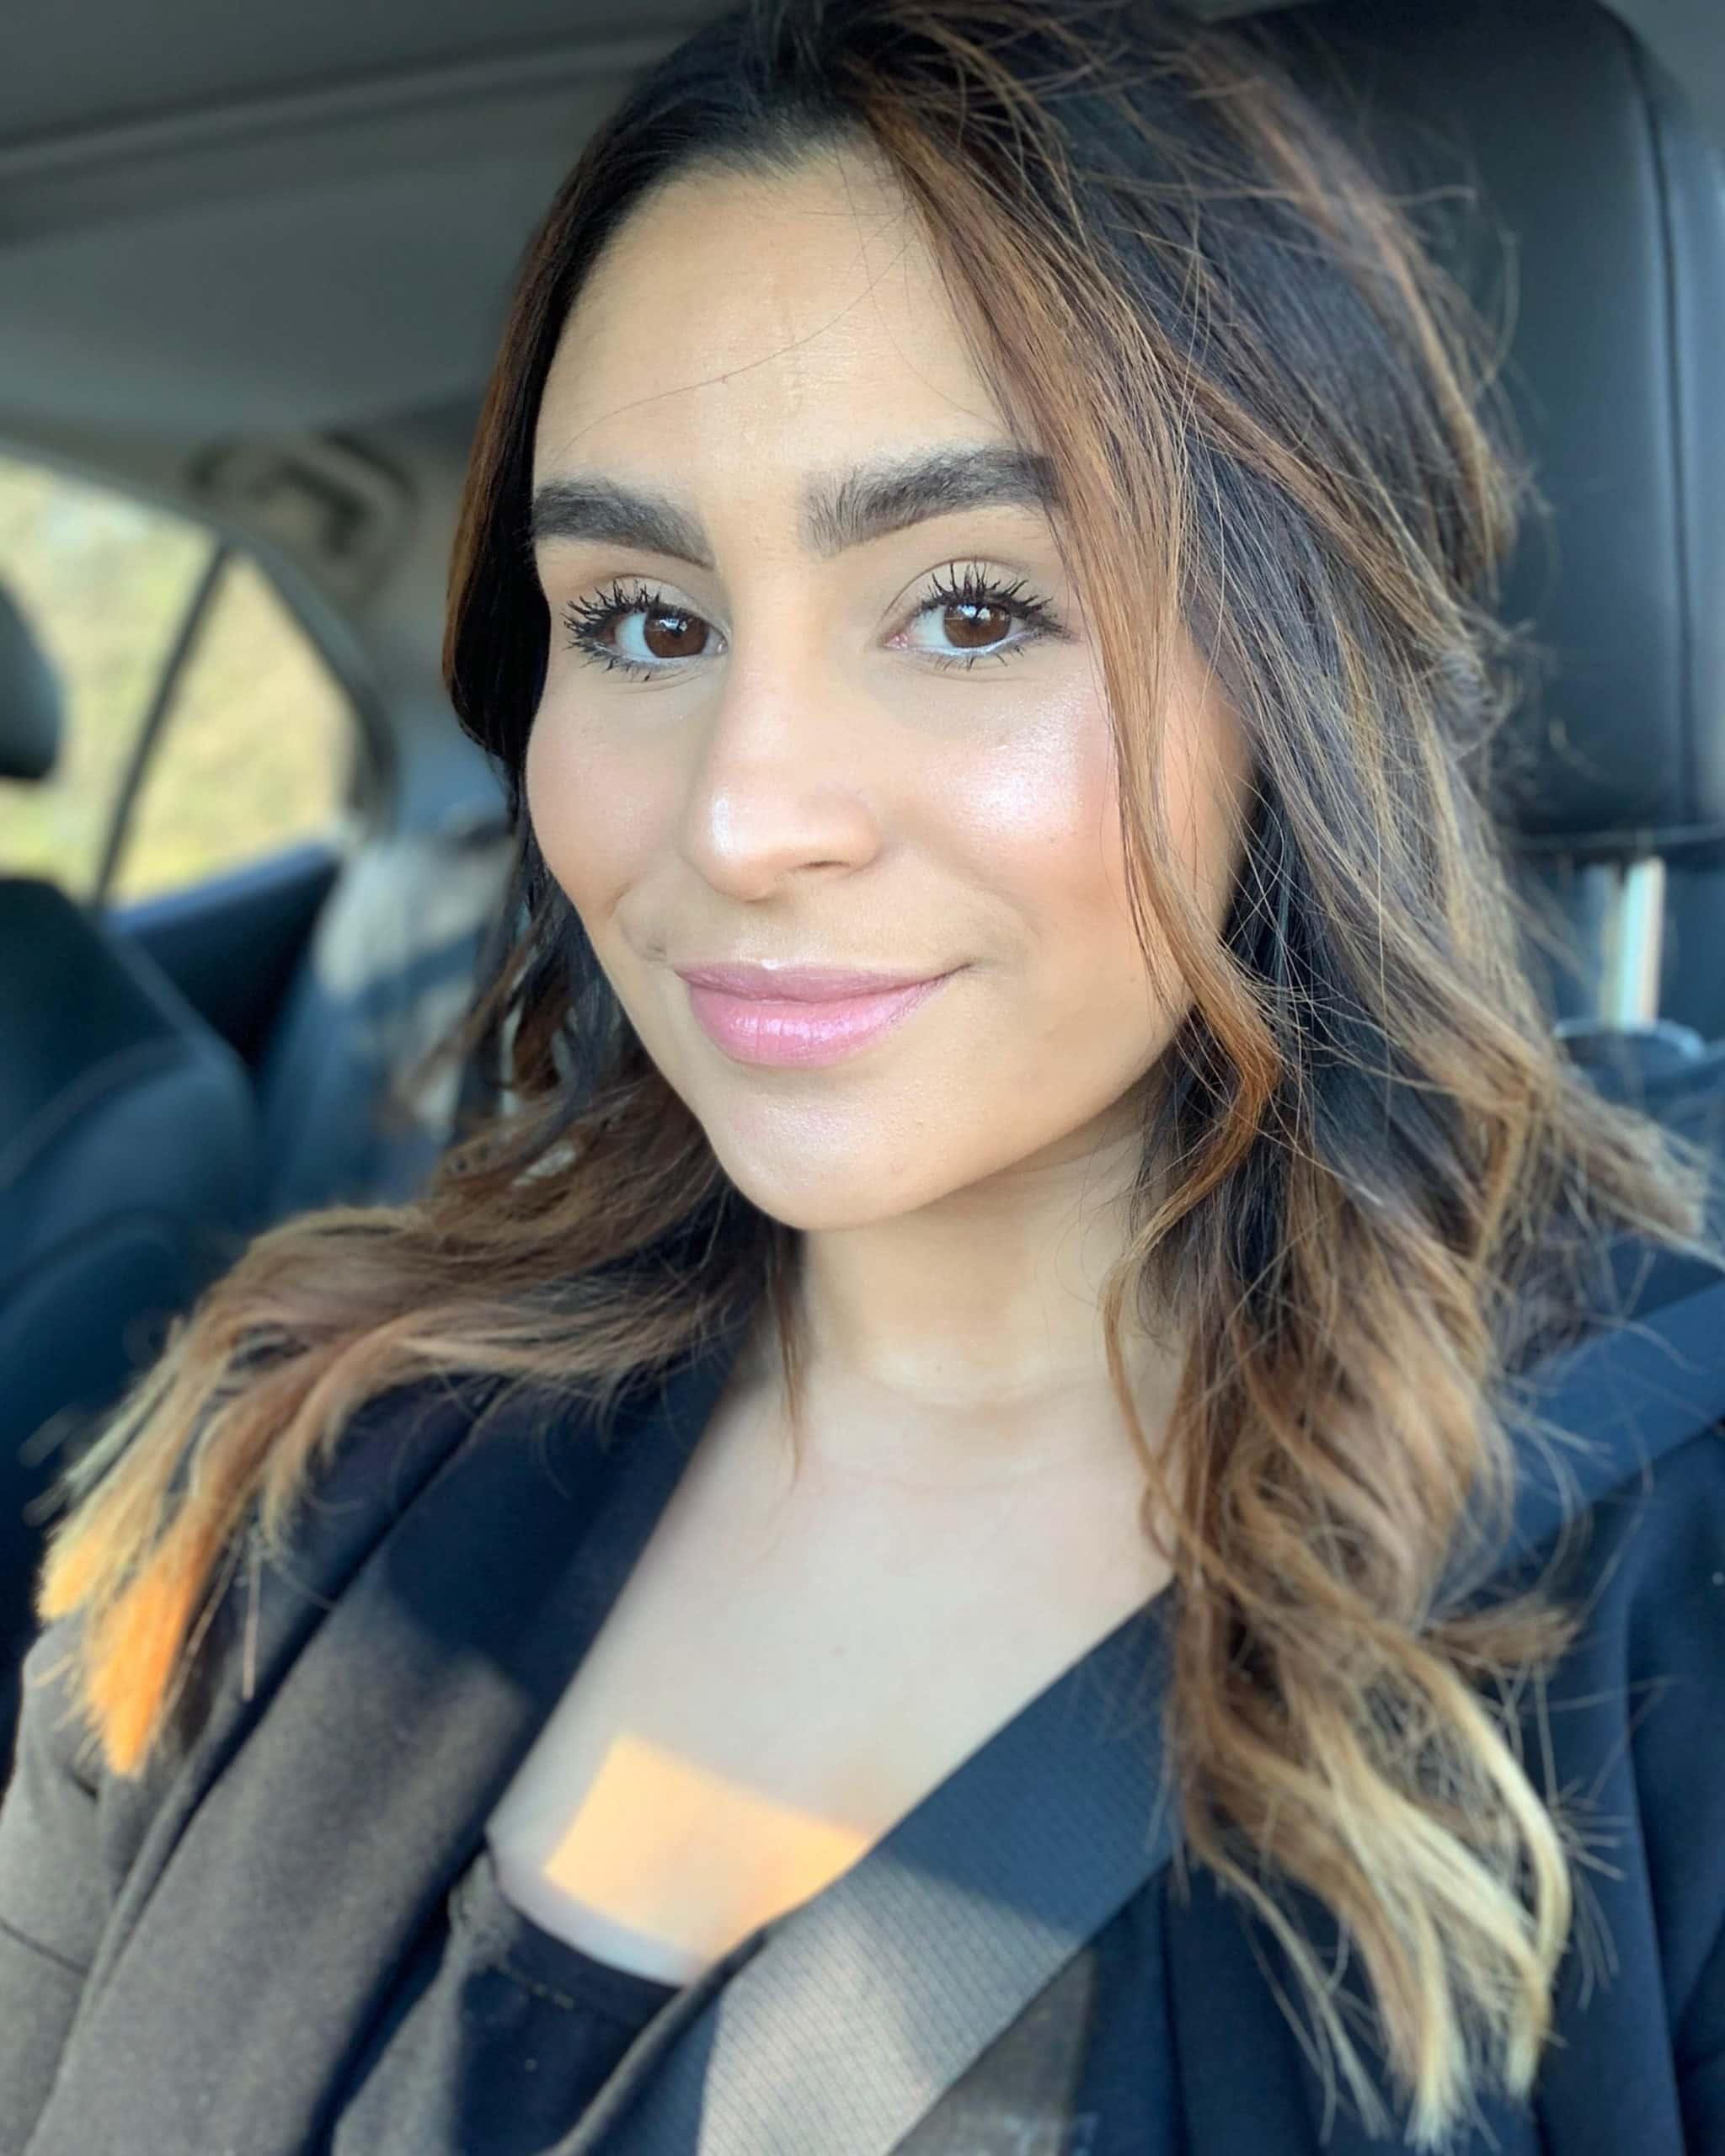 Client Selfie - Before Shot